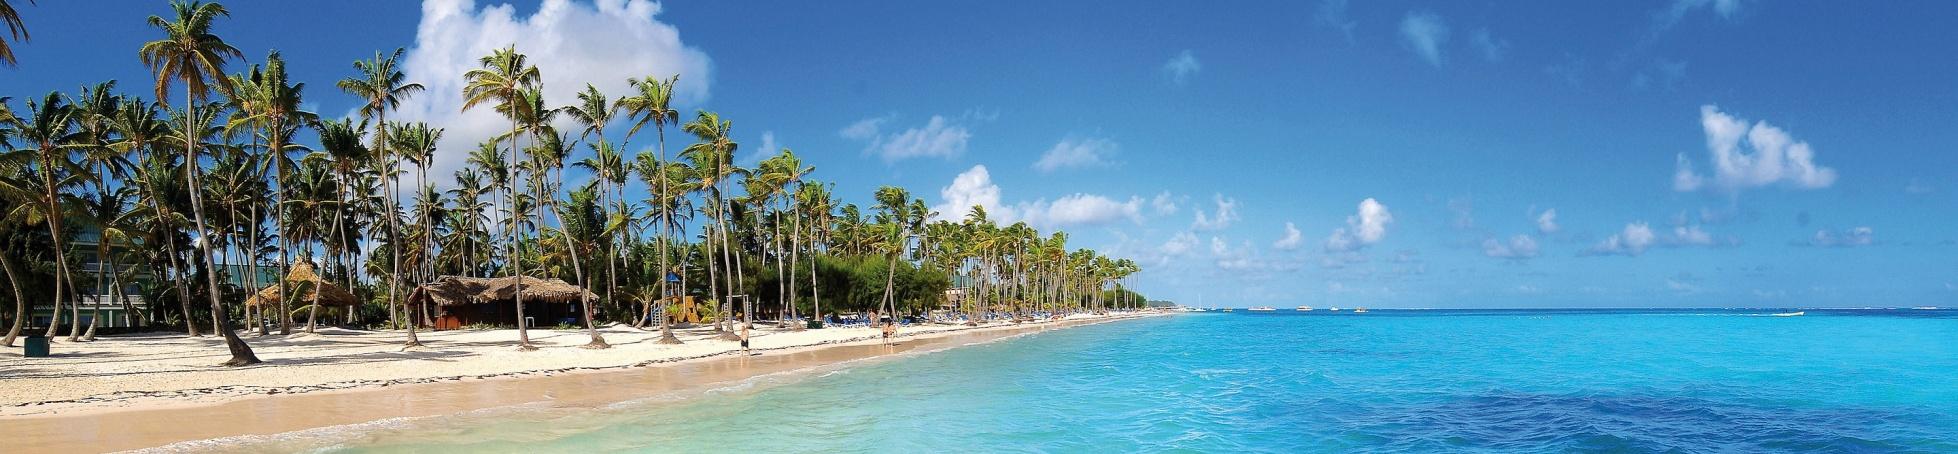 DOMINIKANA NOVA GODINA 2017